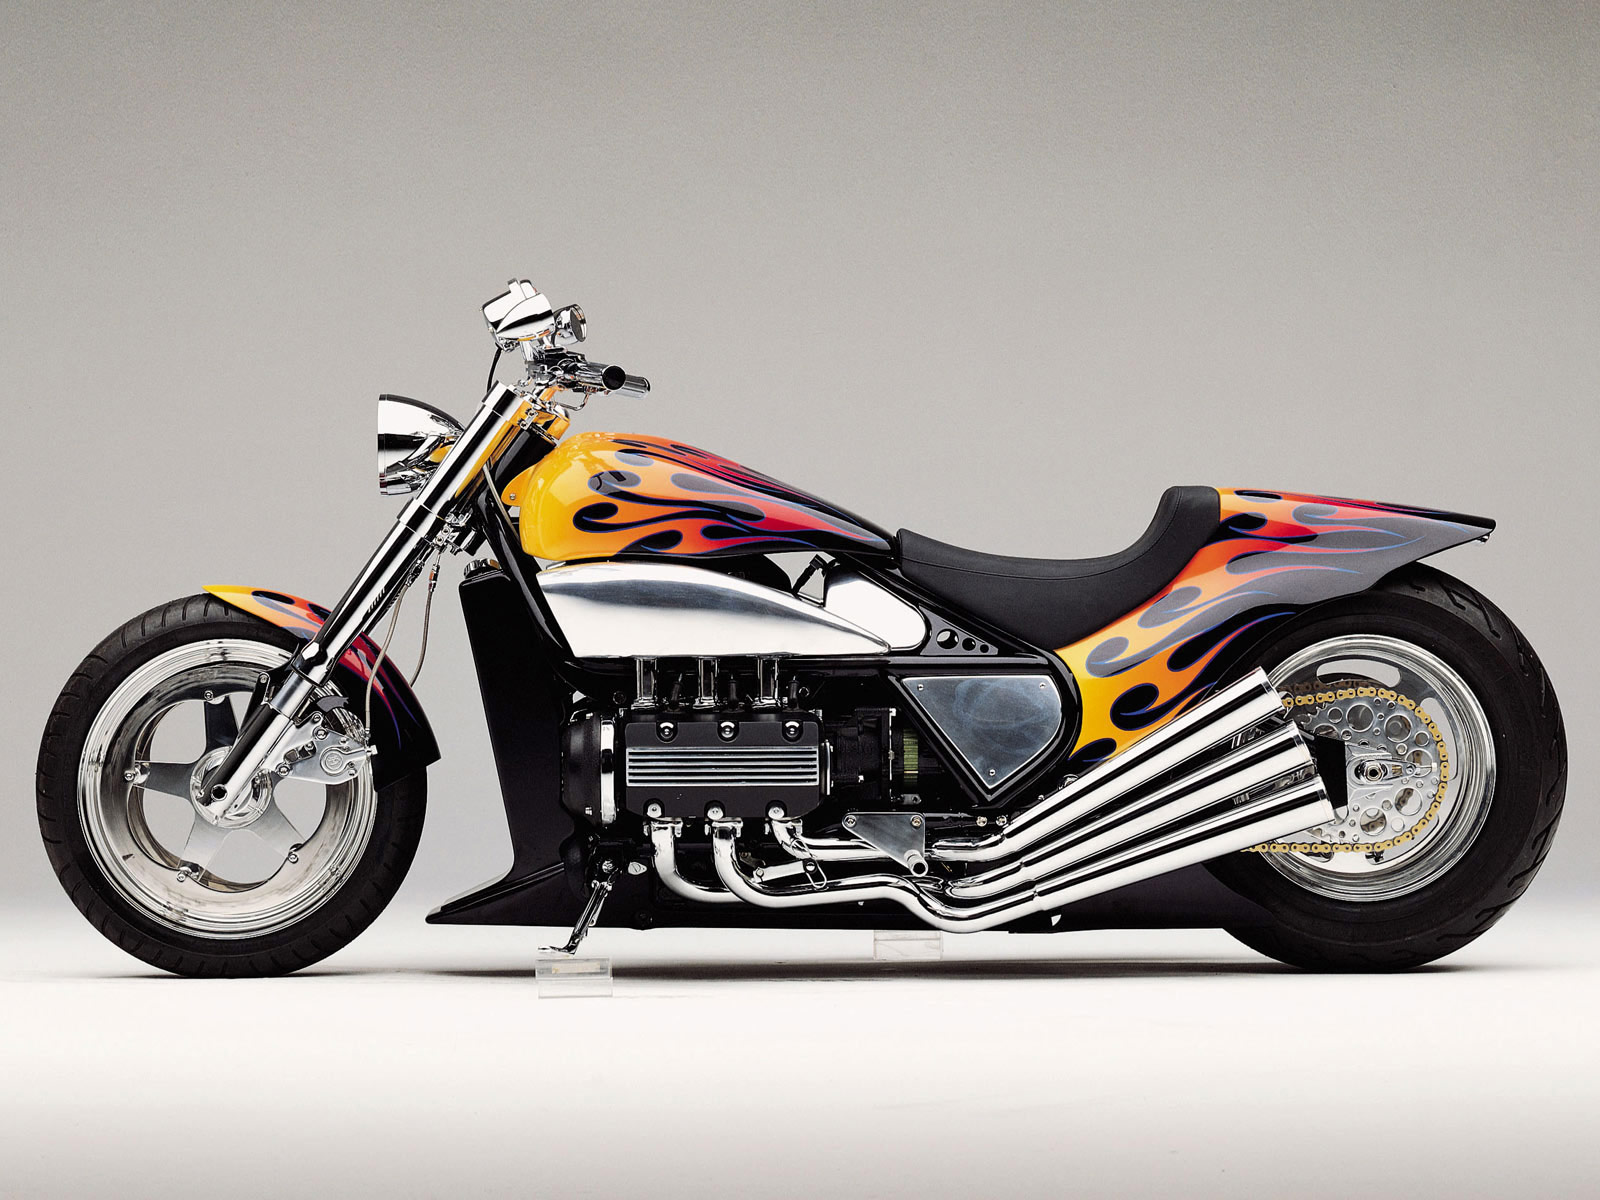 Honda Motorcycle Concept Honda T3 Concept